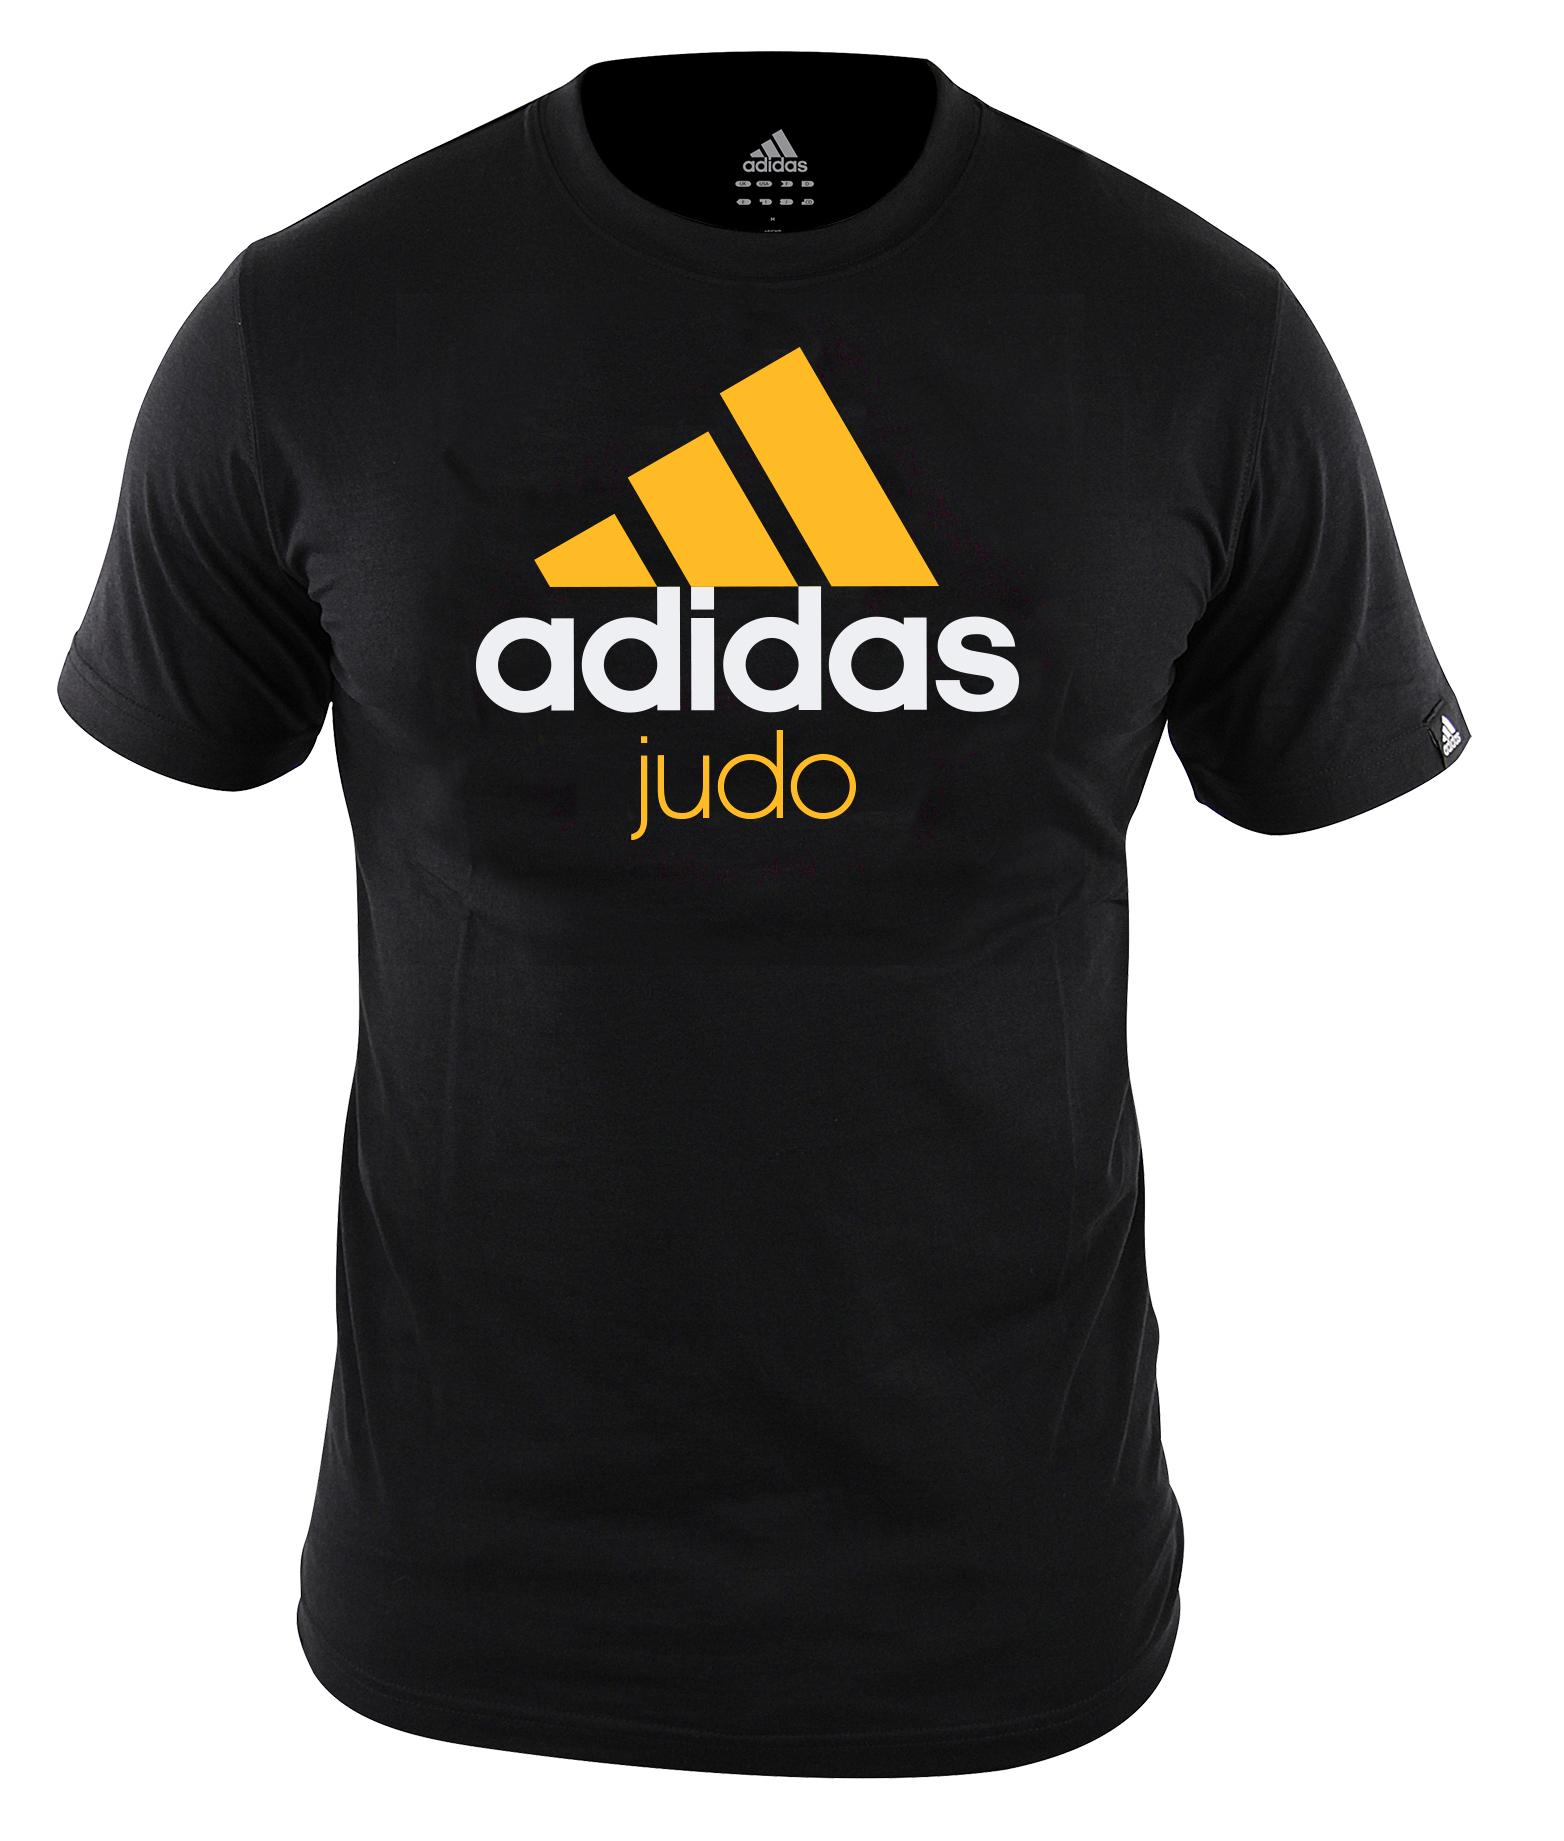 Adidas T-Shirt Judo - Unisex - Junior - Schwarz / Orange - 152